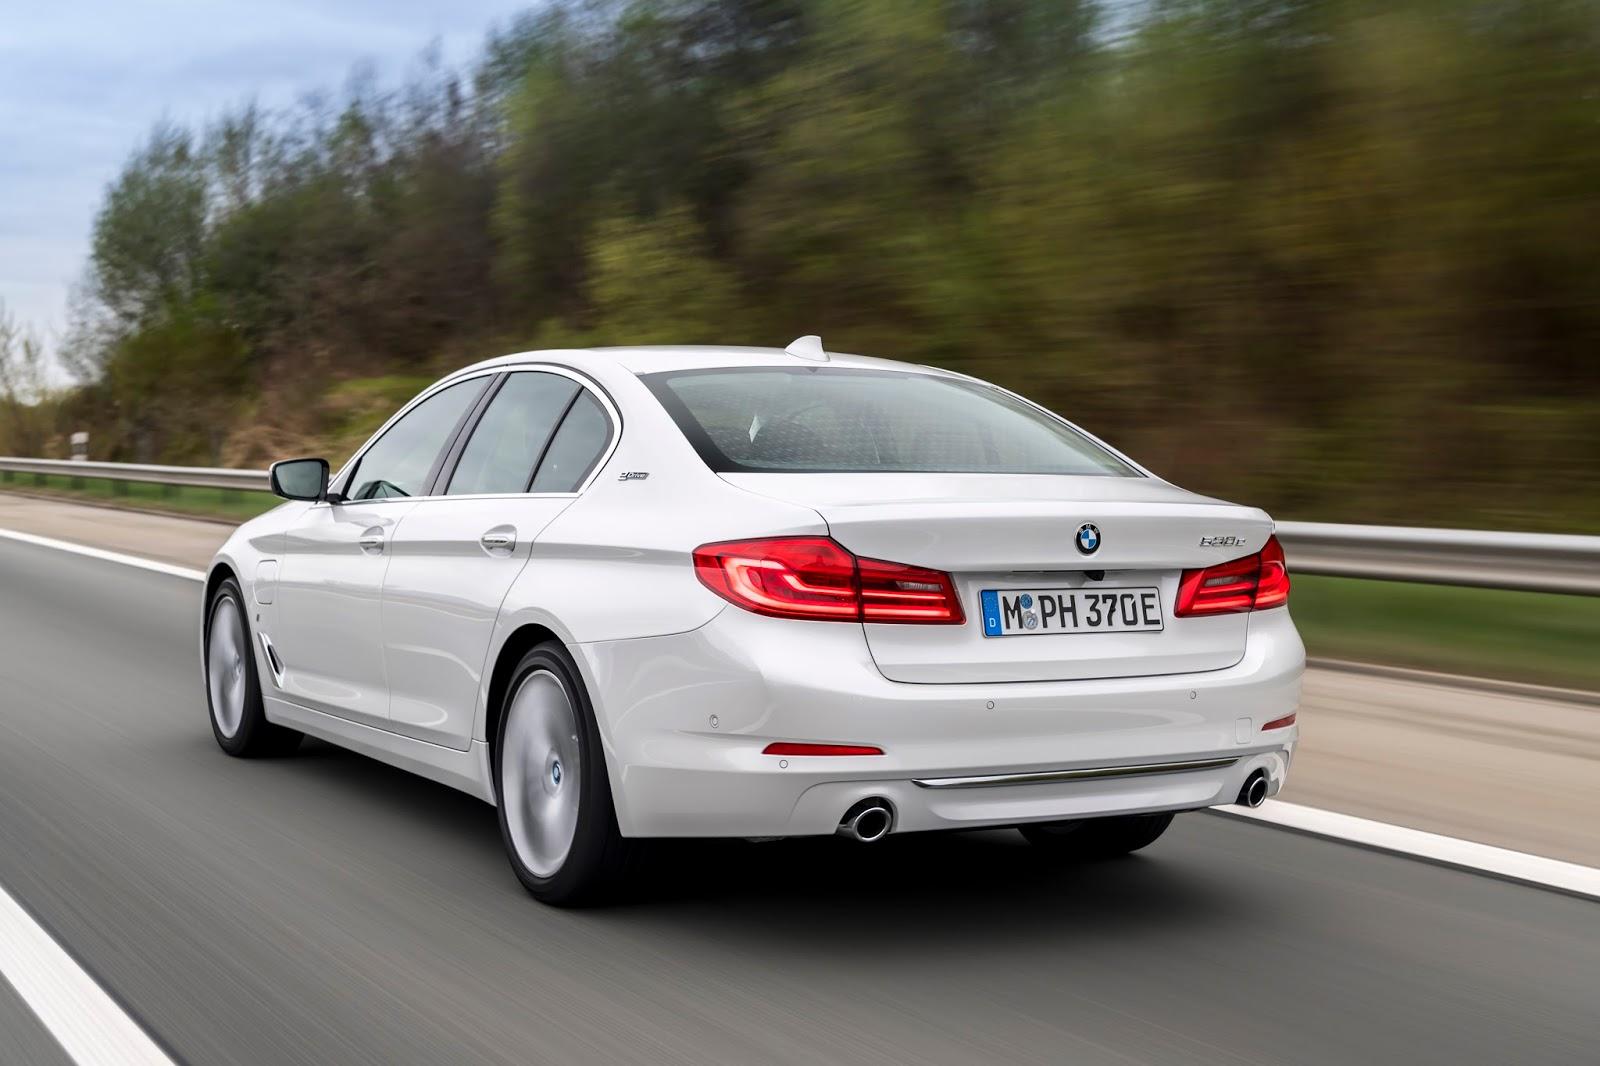 P90256355 highRes the new bmw 530e ipe Η BMW 530e iPerformance φέρνει την ηλεκτρική επανάσταση BMW, BMW 5, BMW 530e iPerformance, Electric cars, Hybrid, Λανσάρισμα